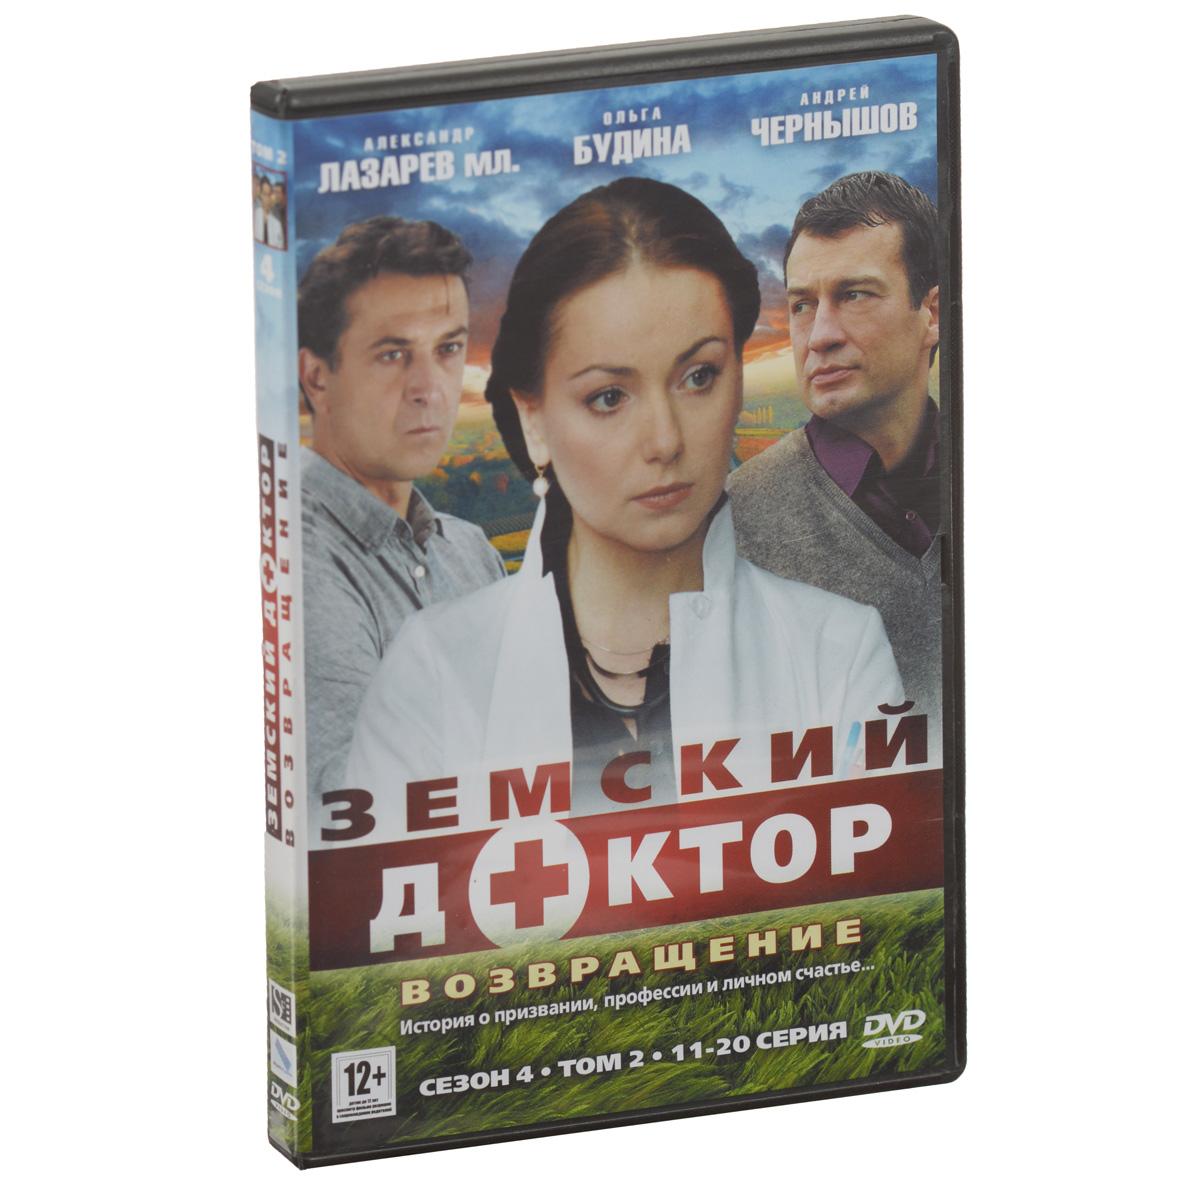 Земский доктор: Возвращение, Серии 11-20 2013 DVD